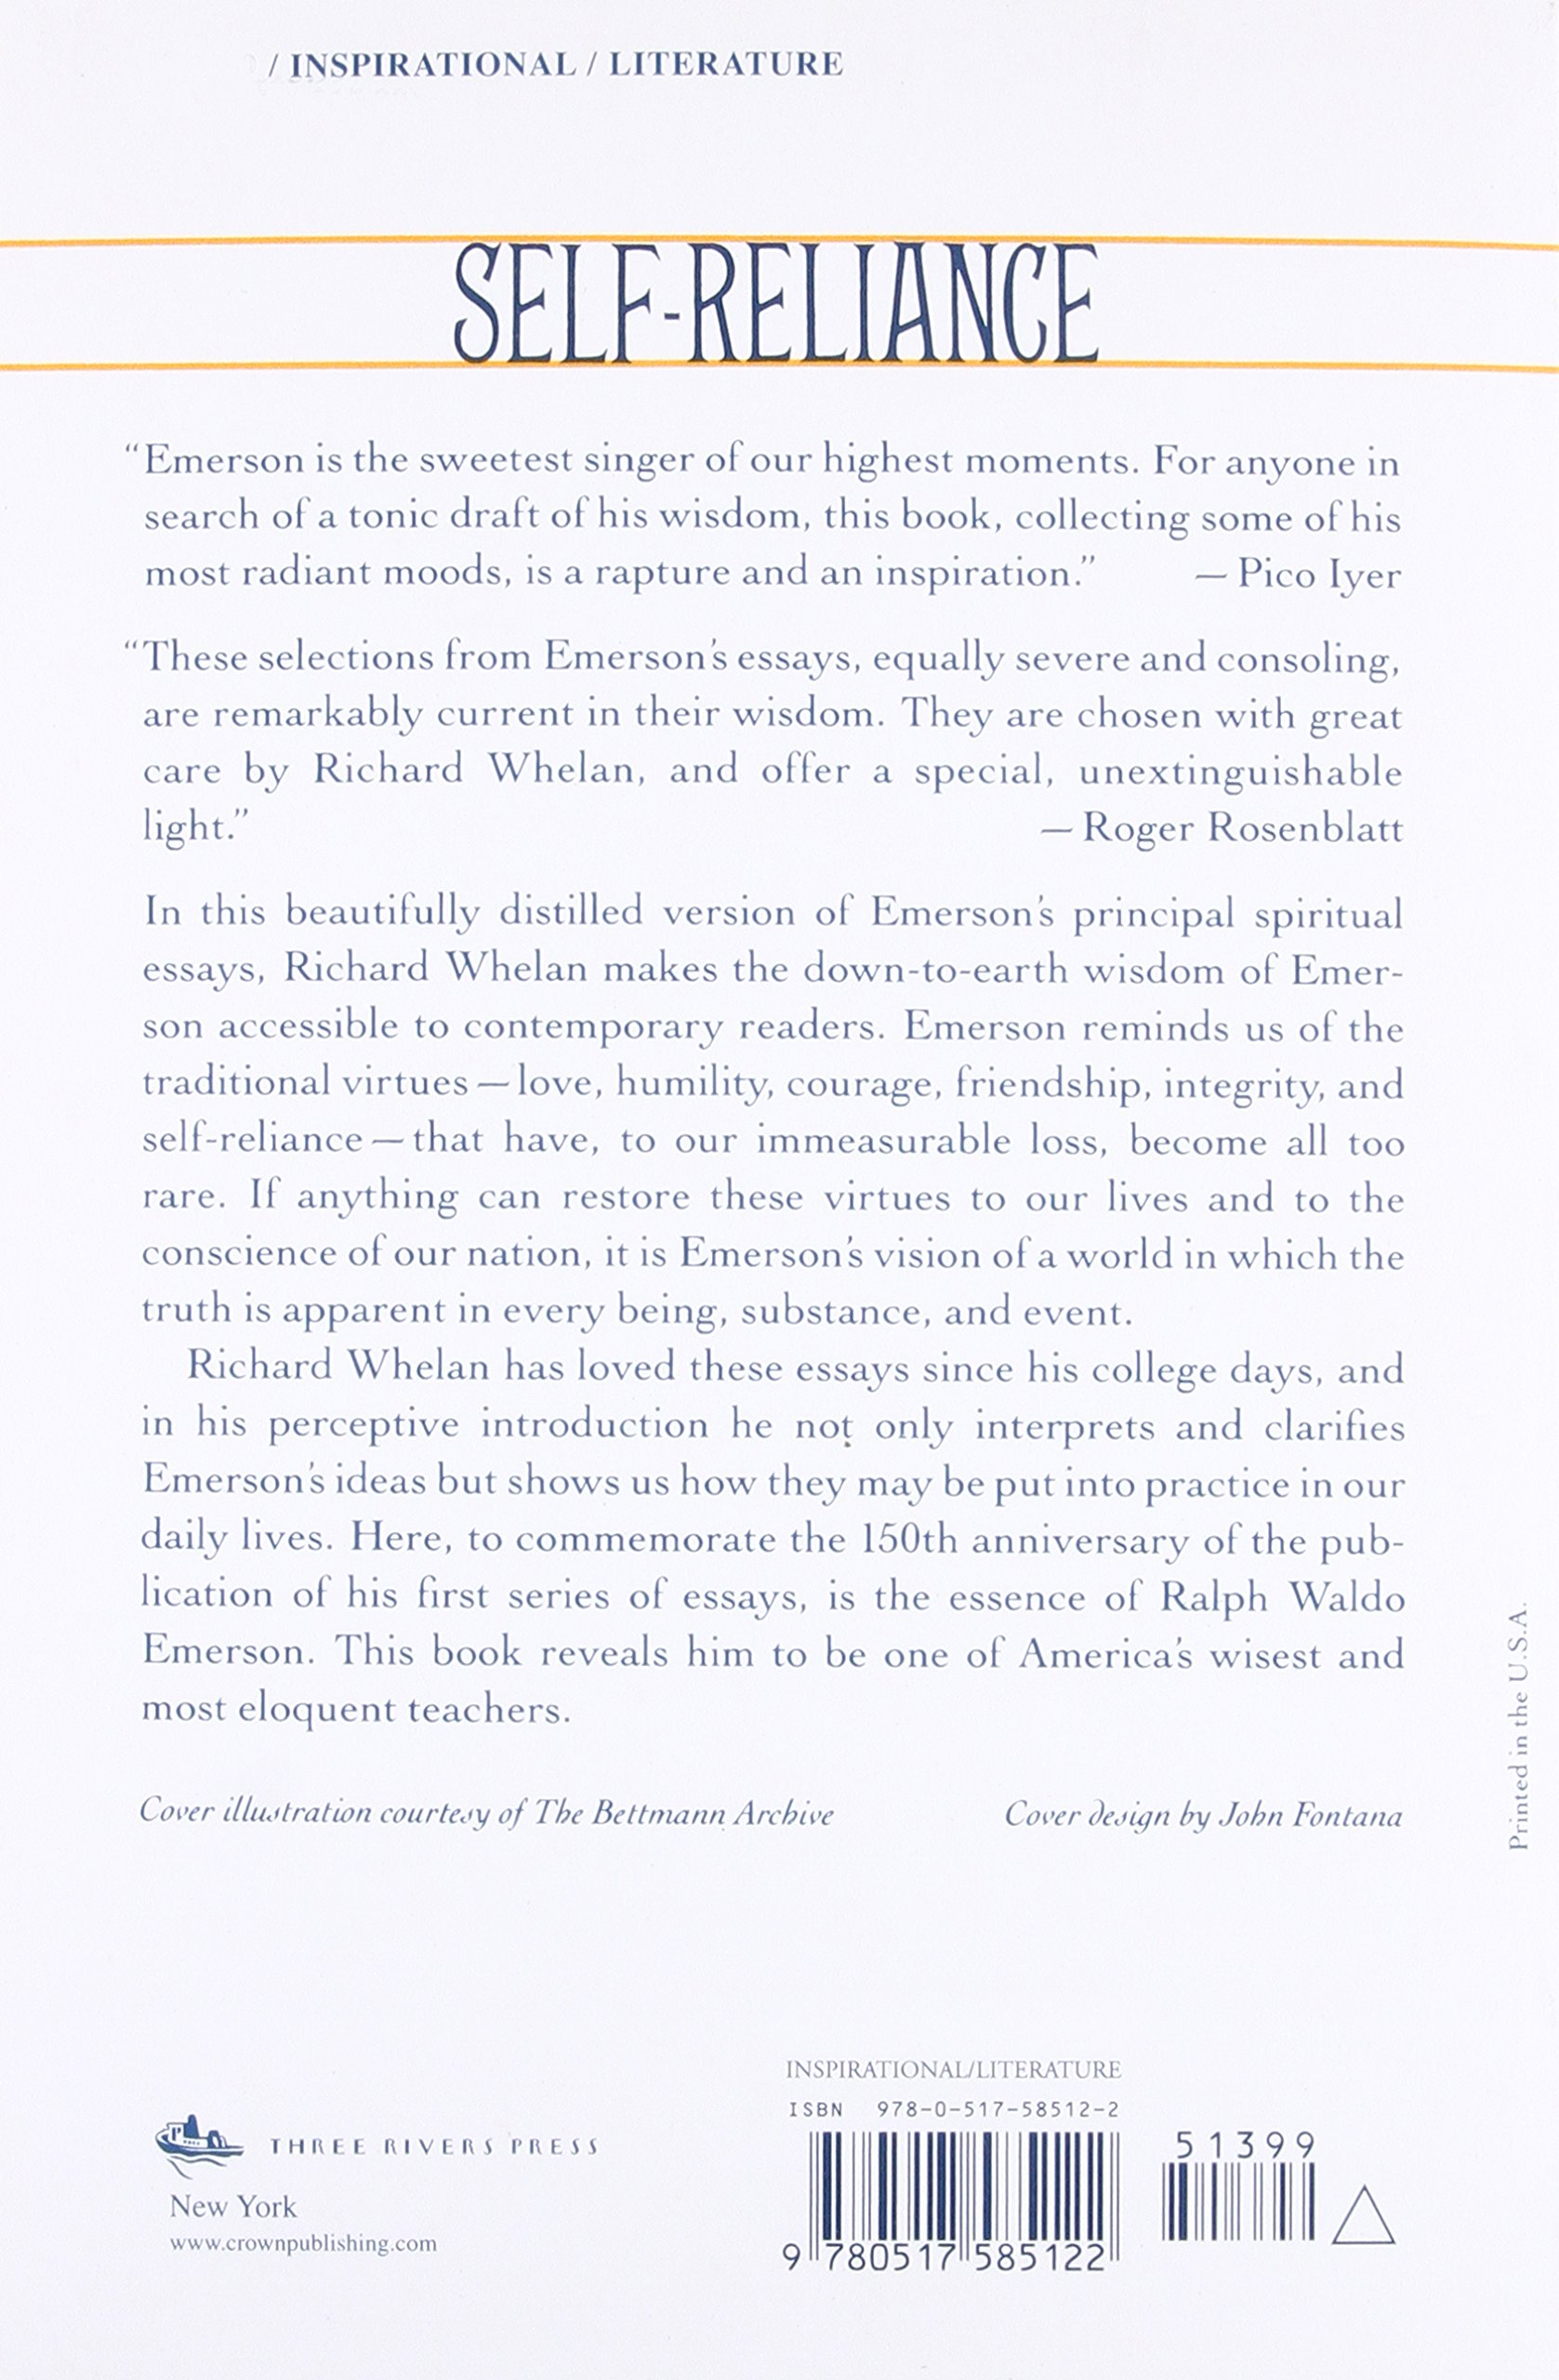 Self reliance the wisdom of ralph waldo emerson as inspiration self reliance the wisdom of ralph waldo emerson as inspiration for daily living richard whelan 9780517585122 amazon books fandeluxe Gallery